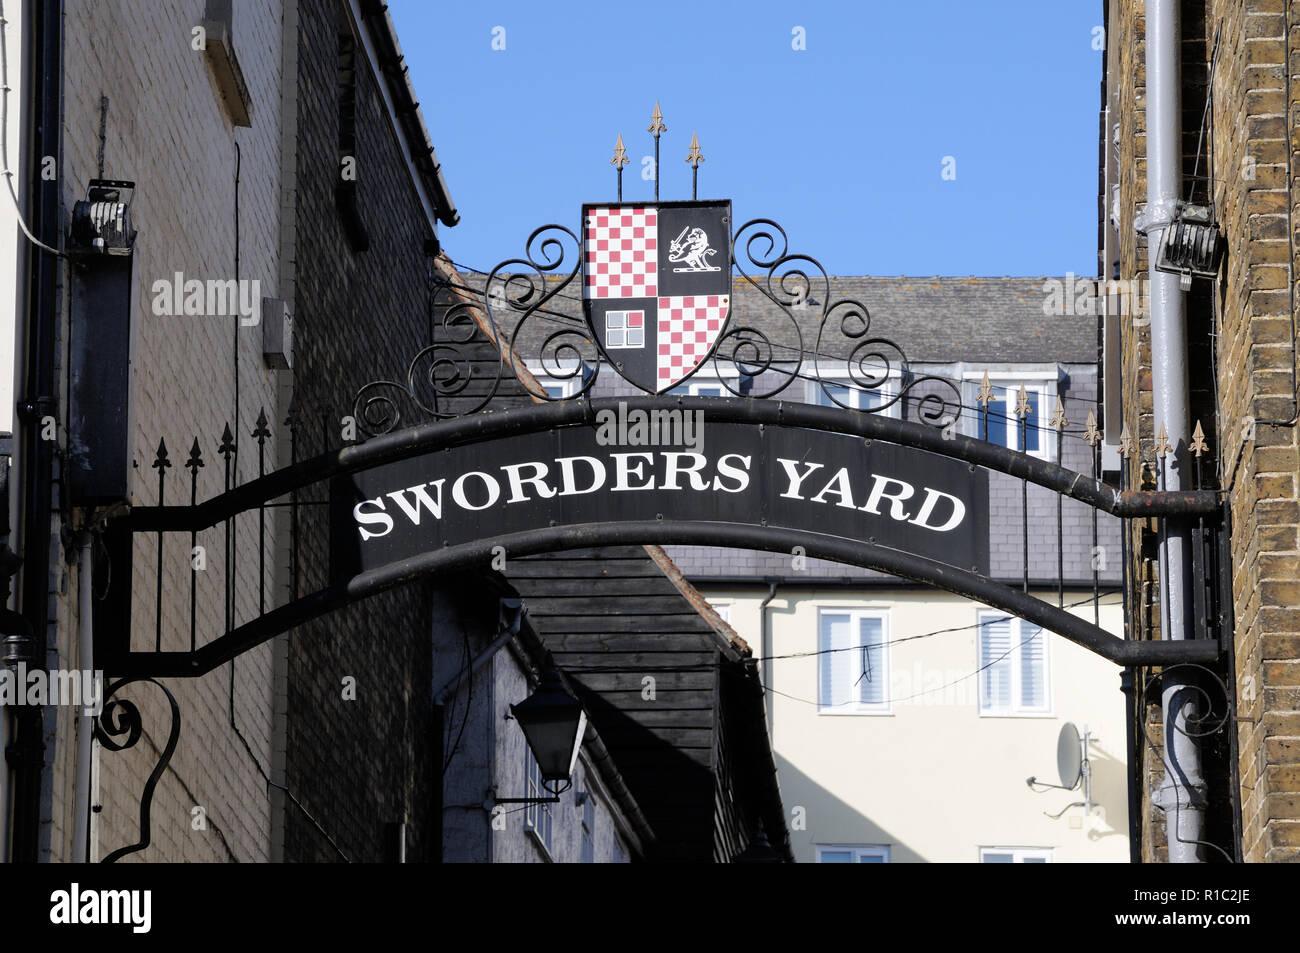 Sworders Yard, Bishops Stortford, Hertfordshire Stock Photo